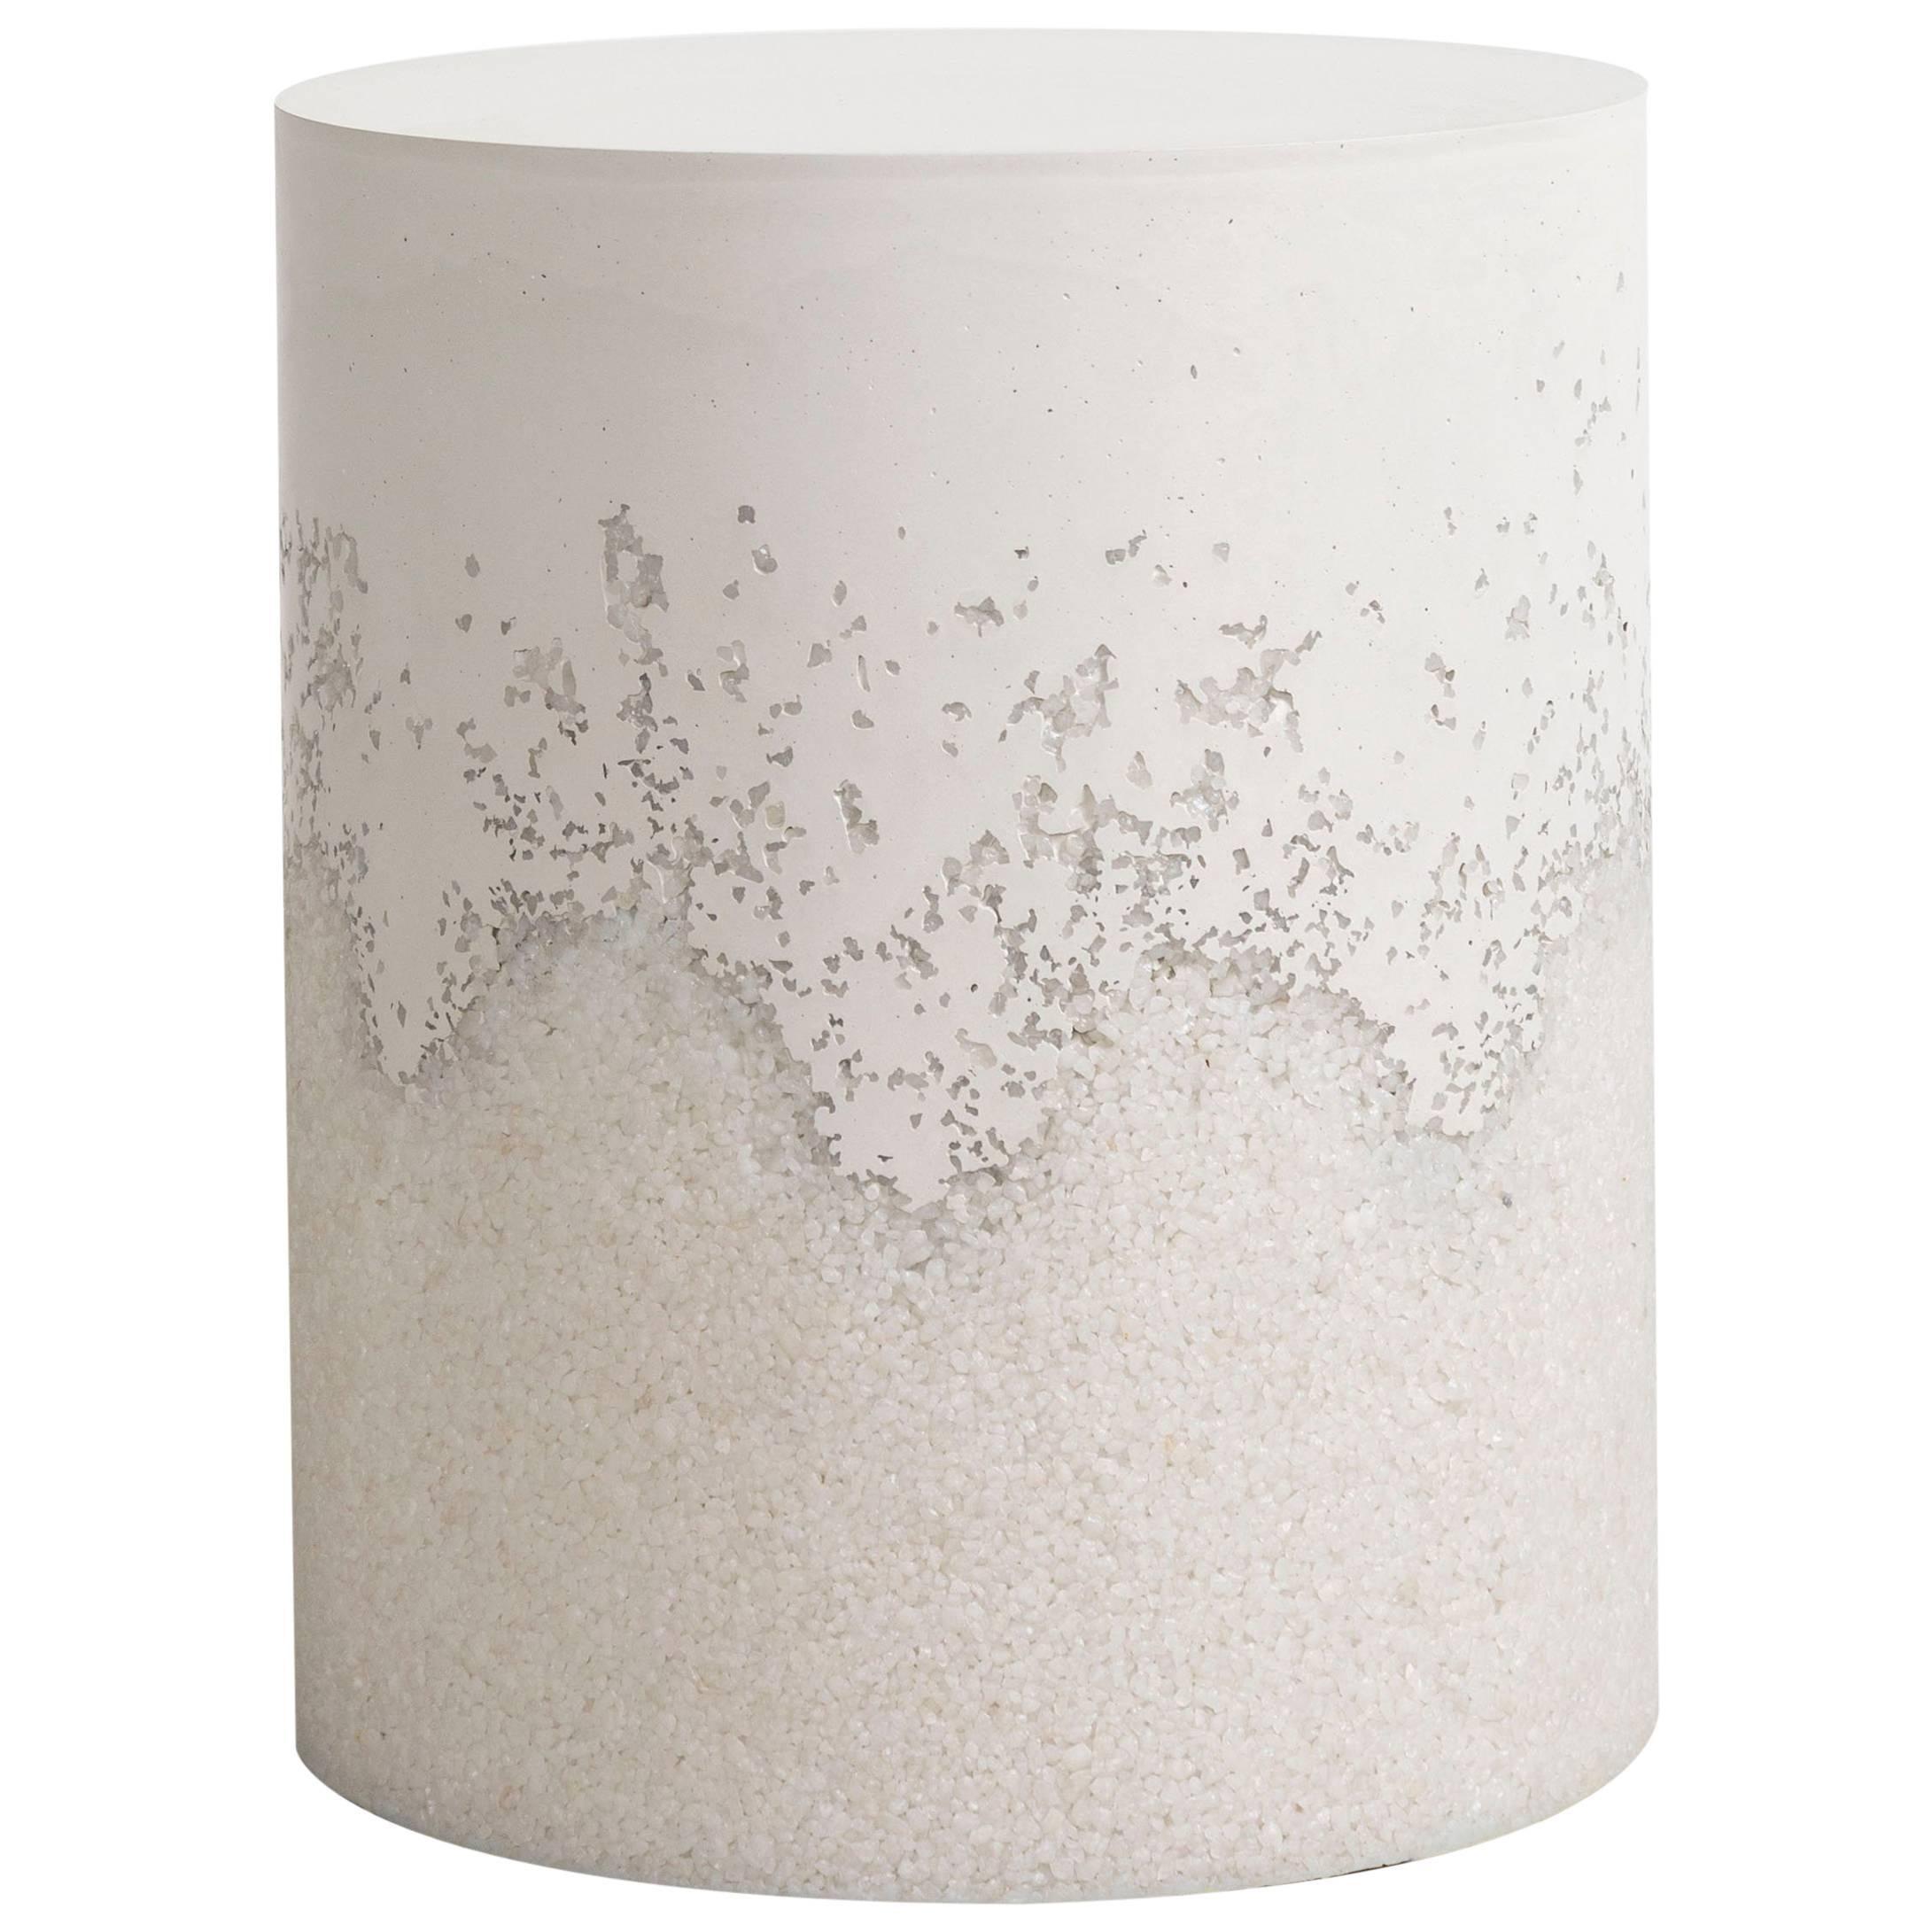 Drum, White Cement and Crystal Quartz by Fernando Mastrangelo